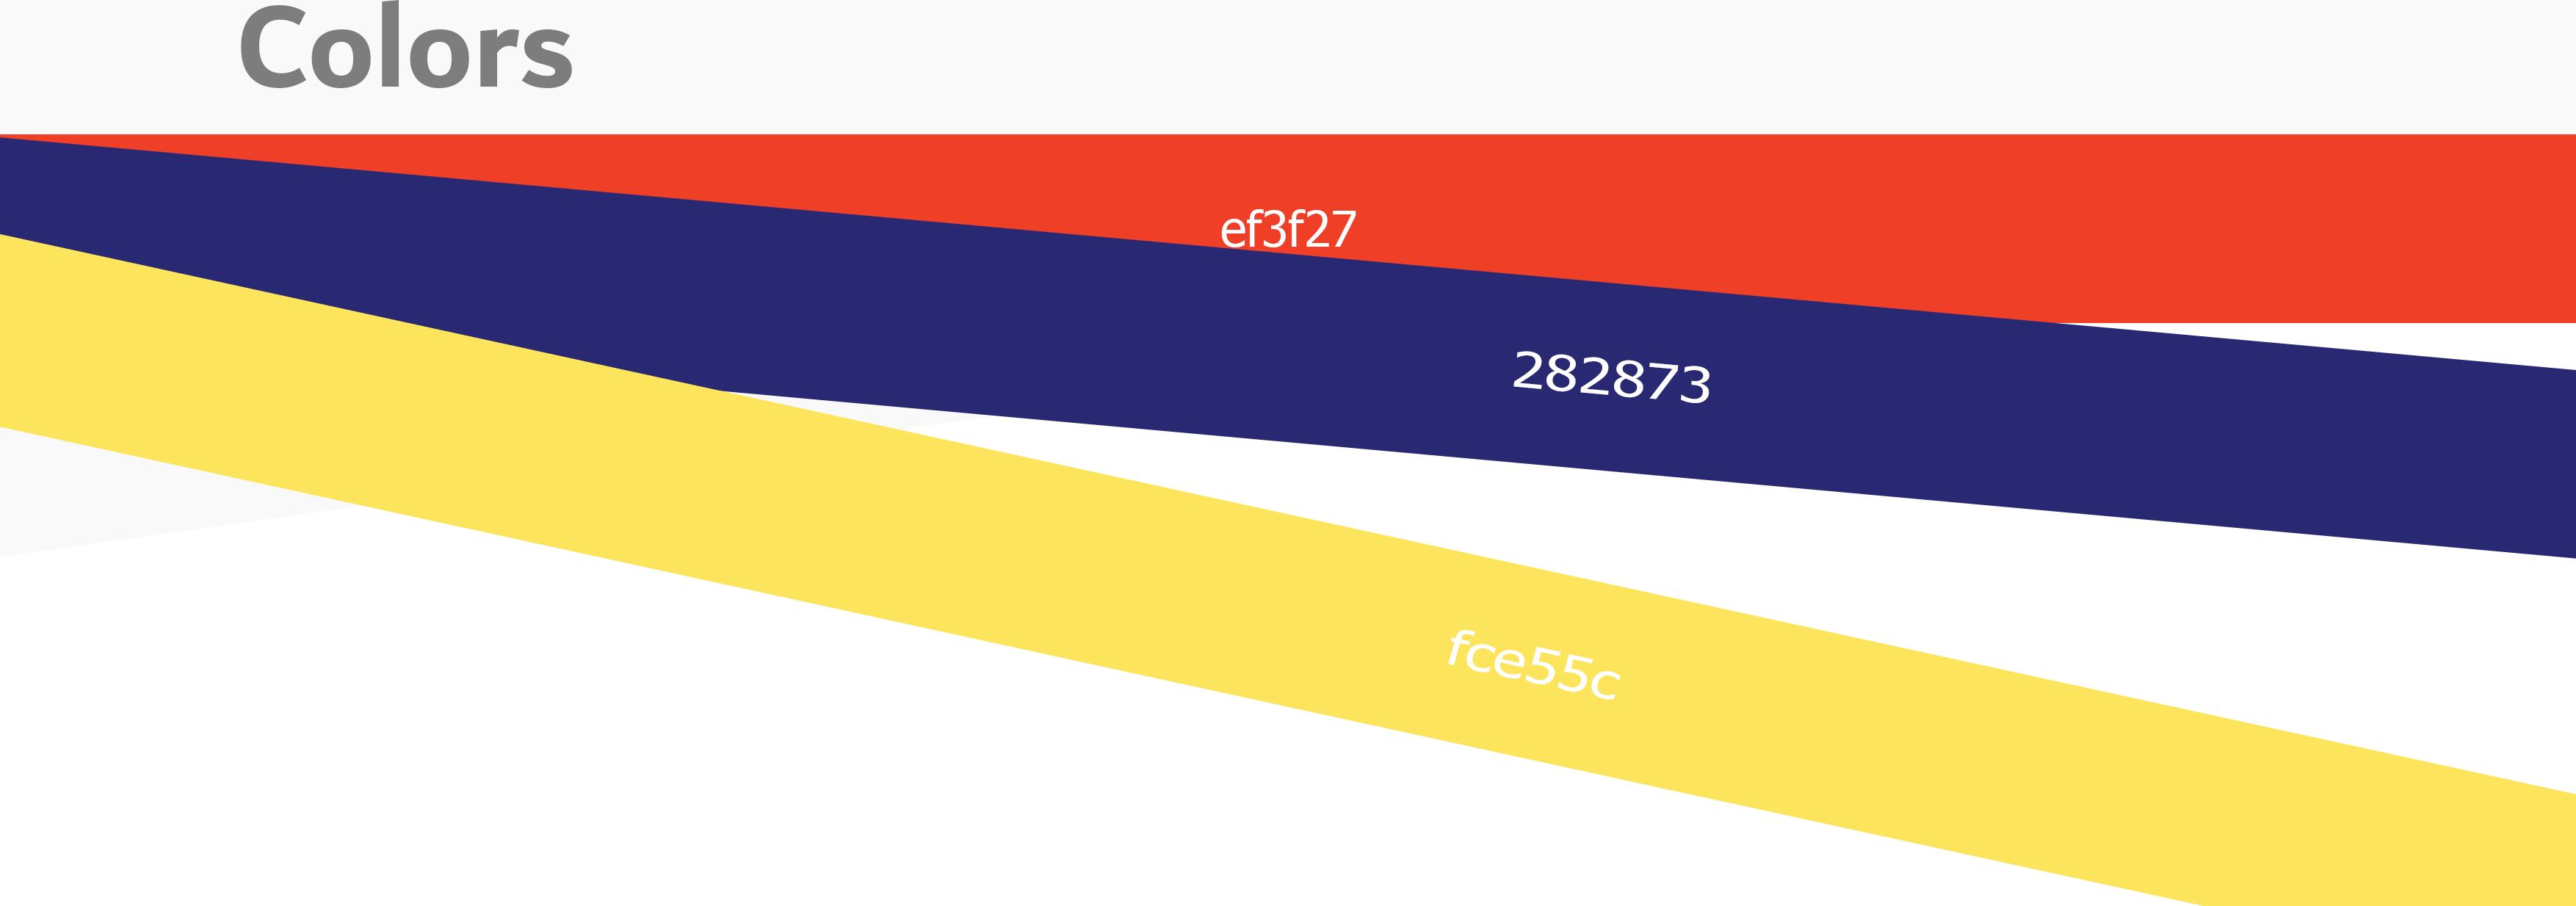 litaearafuu logo colors 01 momenarts